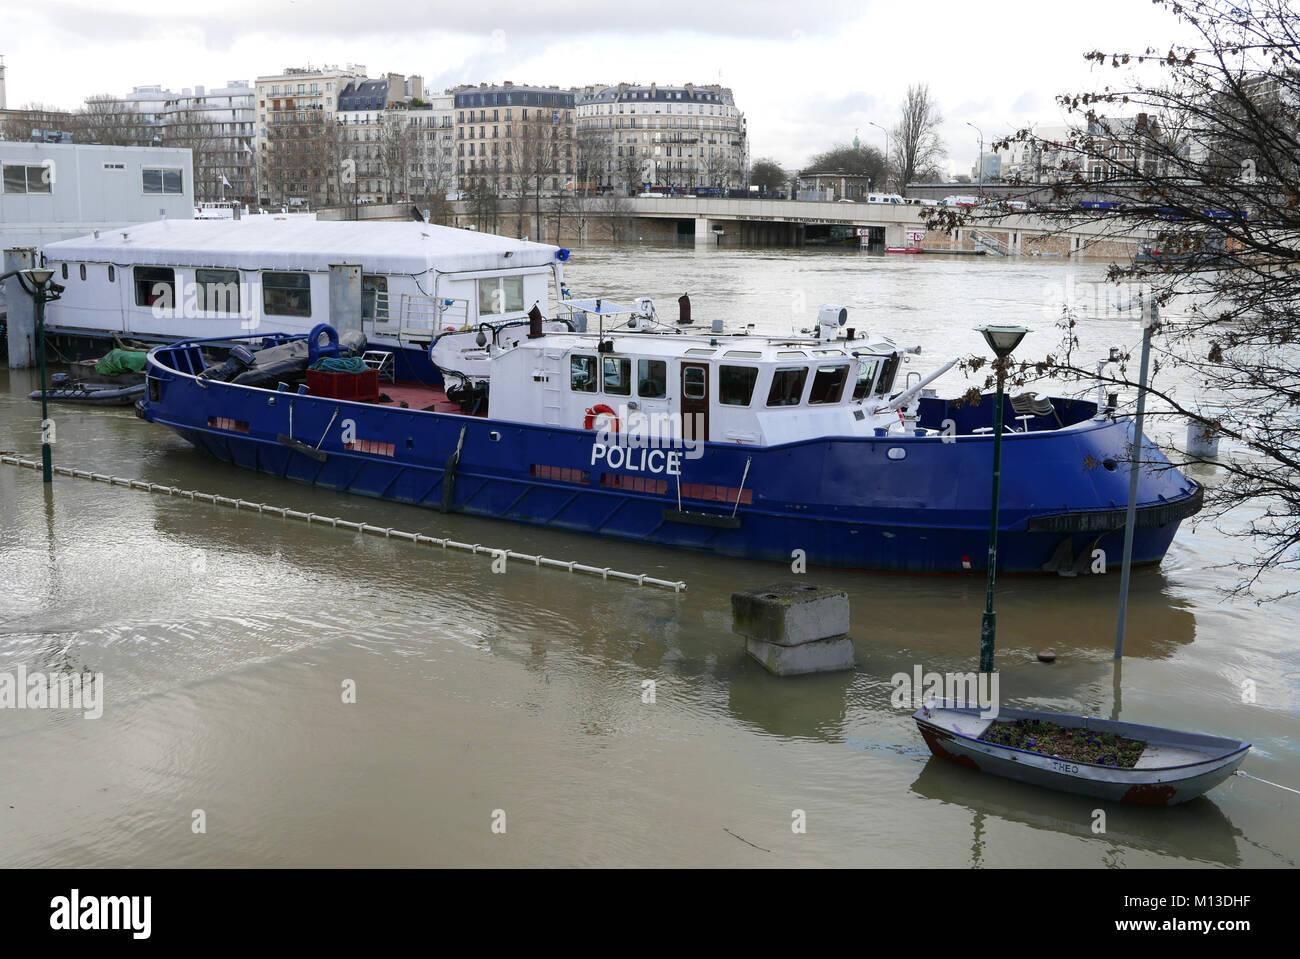 Tug of the Brigade Fluviale, Quai Saint-Bernard, flood of the Seine river, January 25, 2018, Paris, France - Stock Image